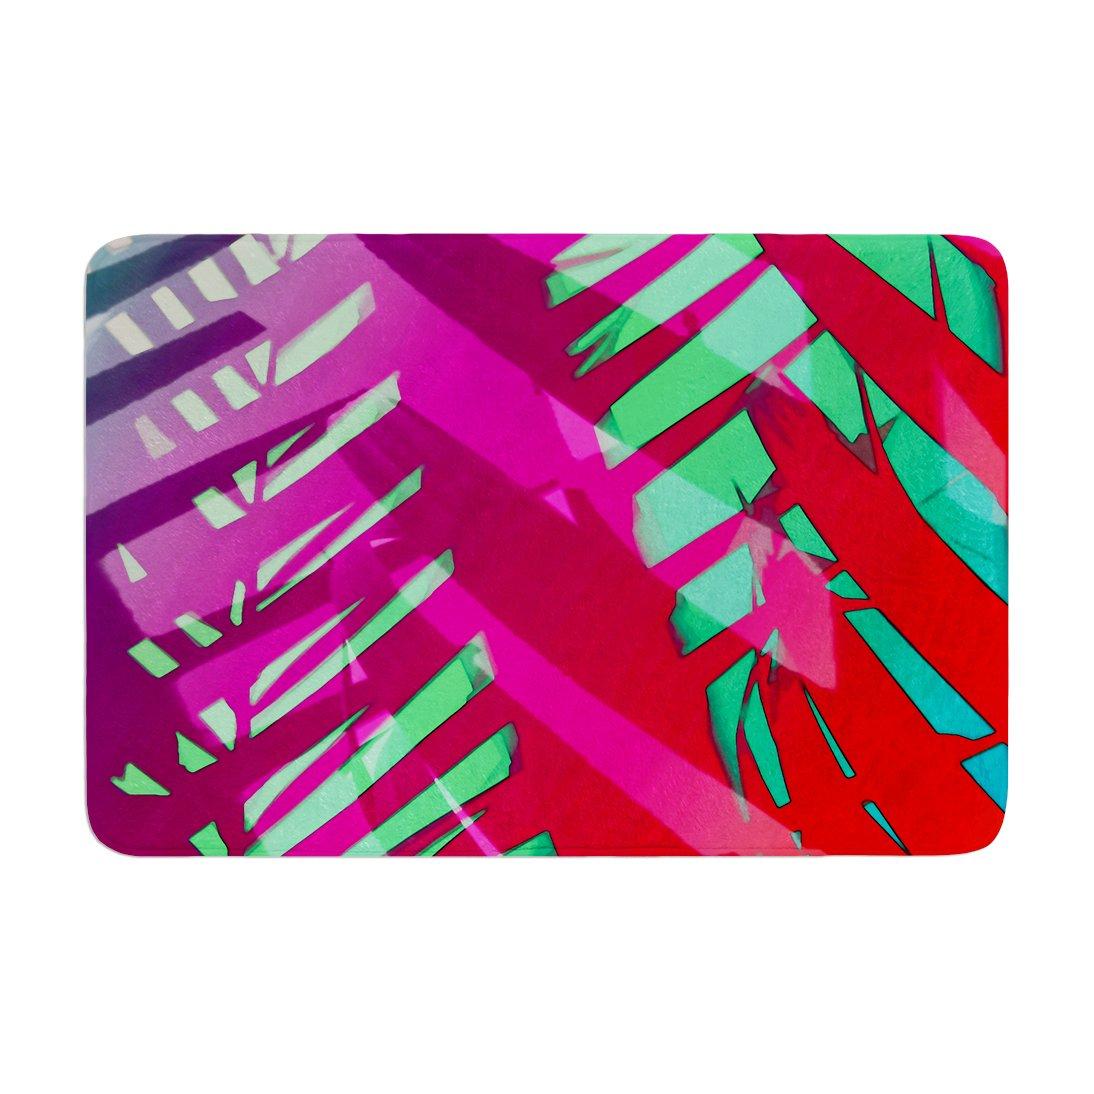 17 by 24 Kess InHouse Alison Coxon Hot Tropical Pink Red Memory Foam Bath Mat